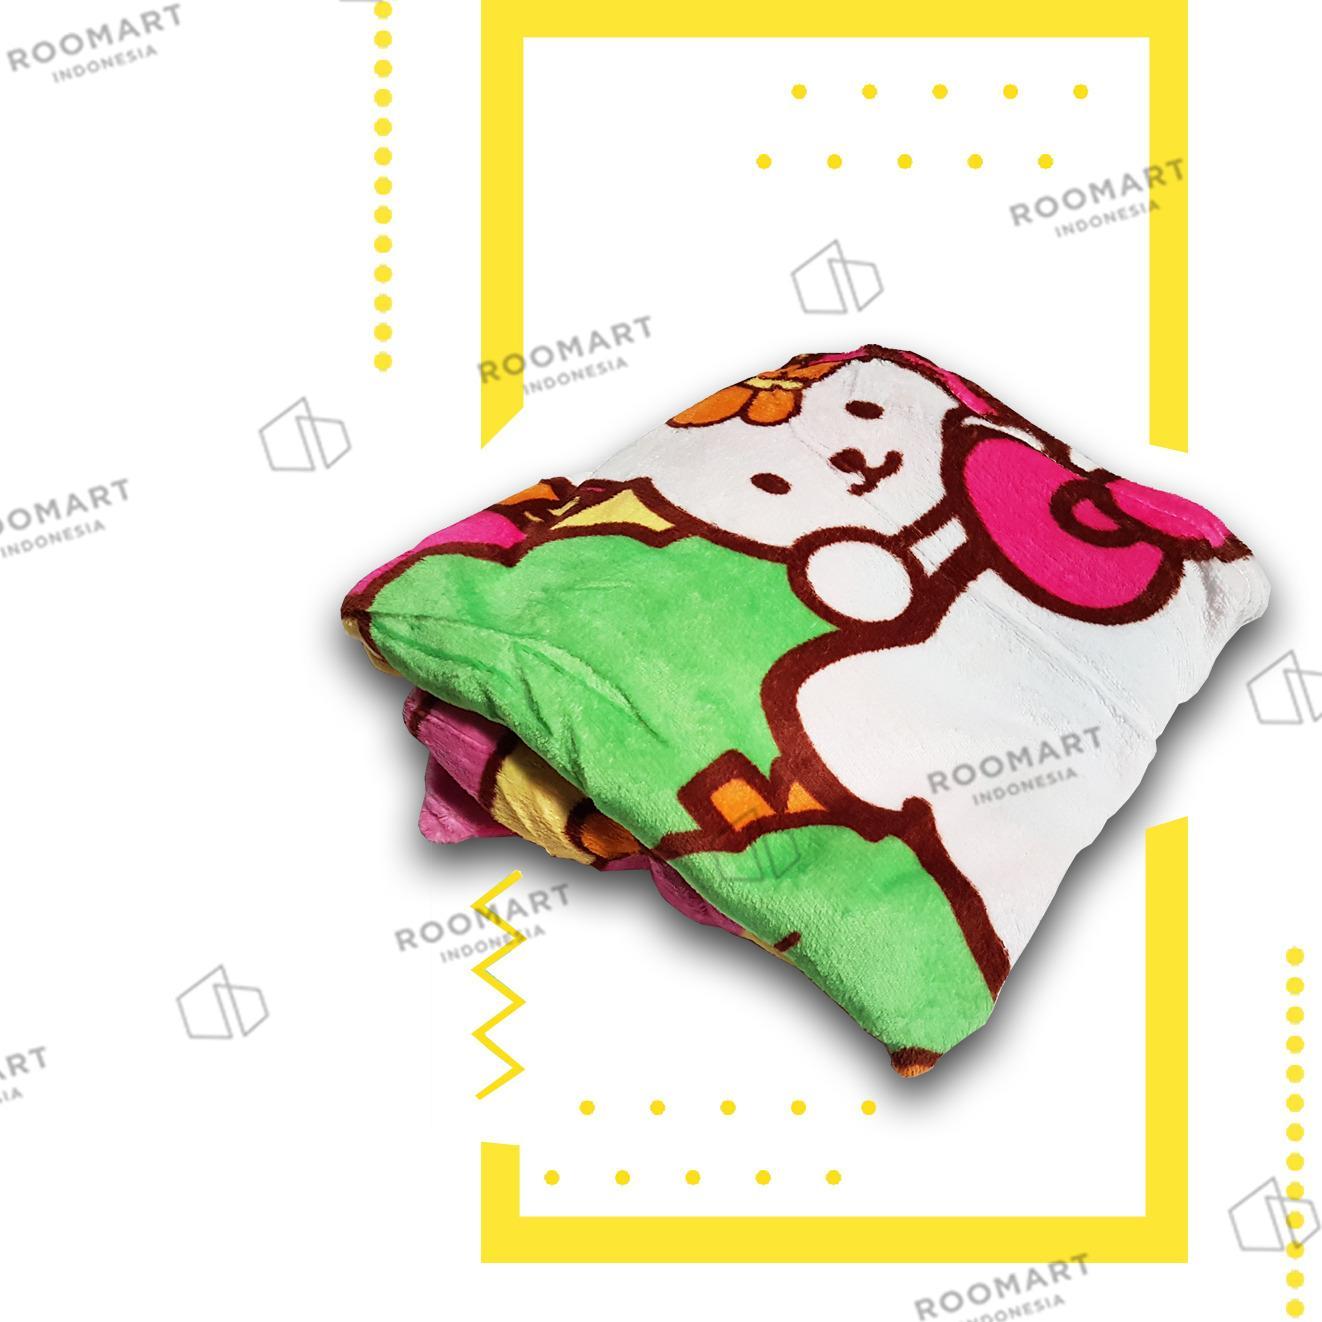 Cek Harga Baru Selimut Anak Karakter Hello Kitty And Friends Ukuran Gambar Produk Rinci 135x150 Cm Terkini